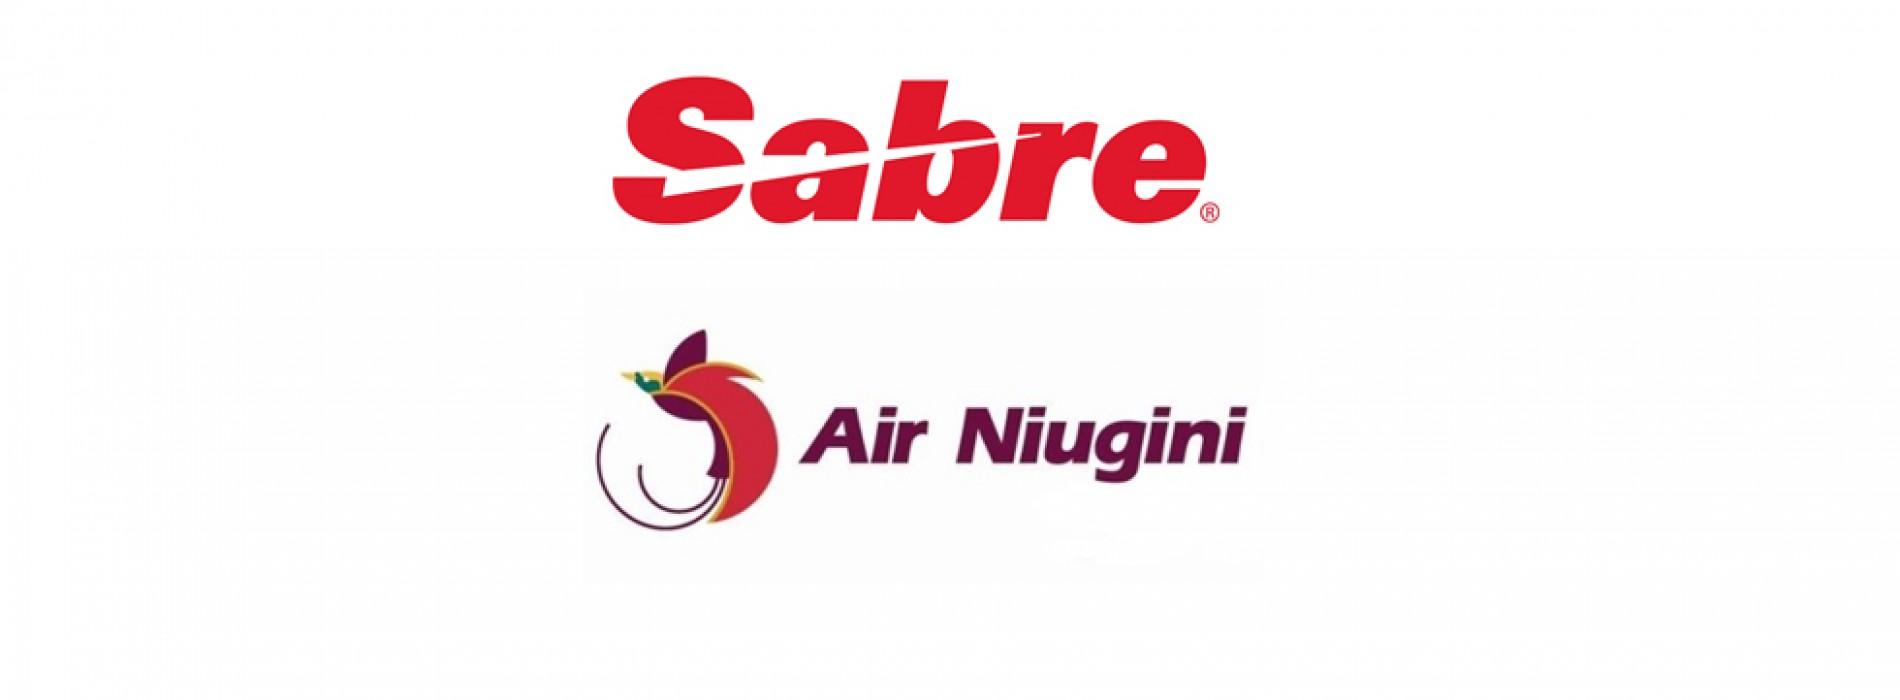 Sabre expands into Papua New Guinea travel market with Air Niugini distribution partnership